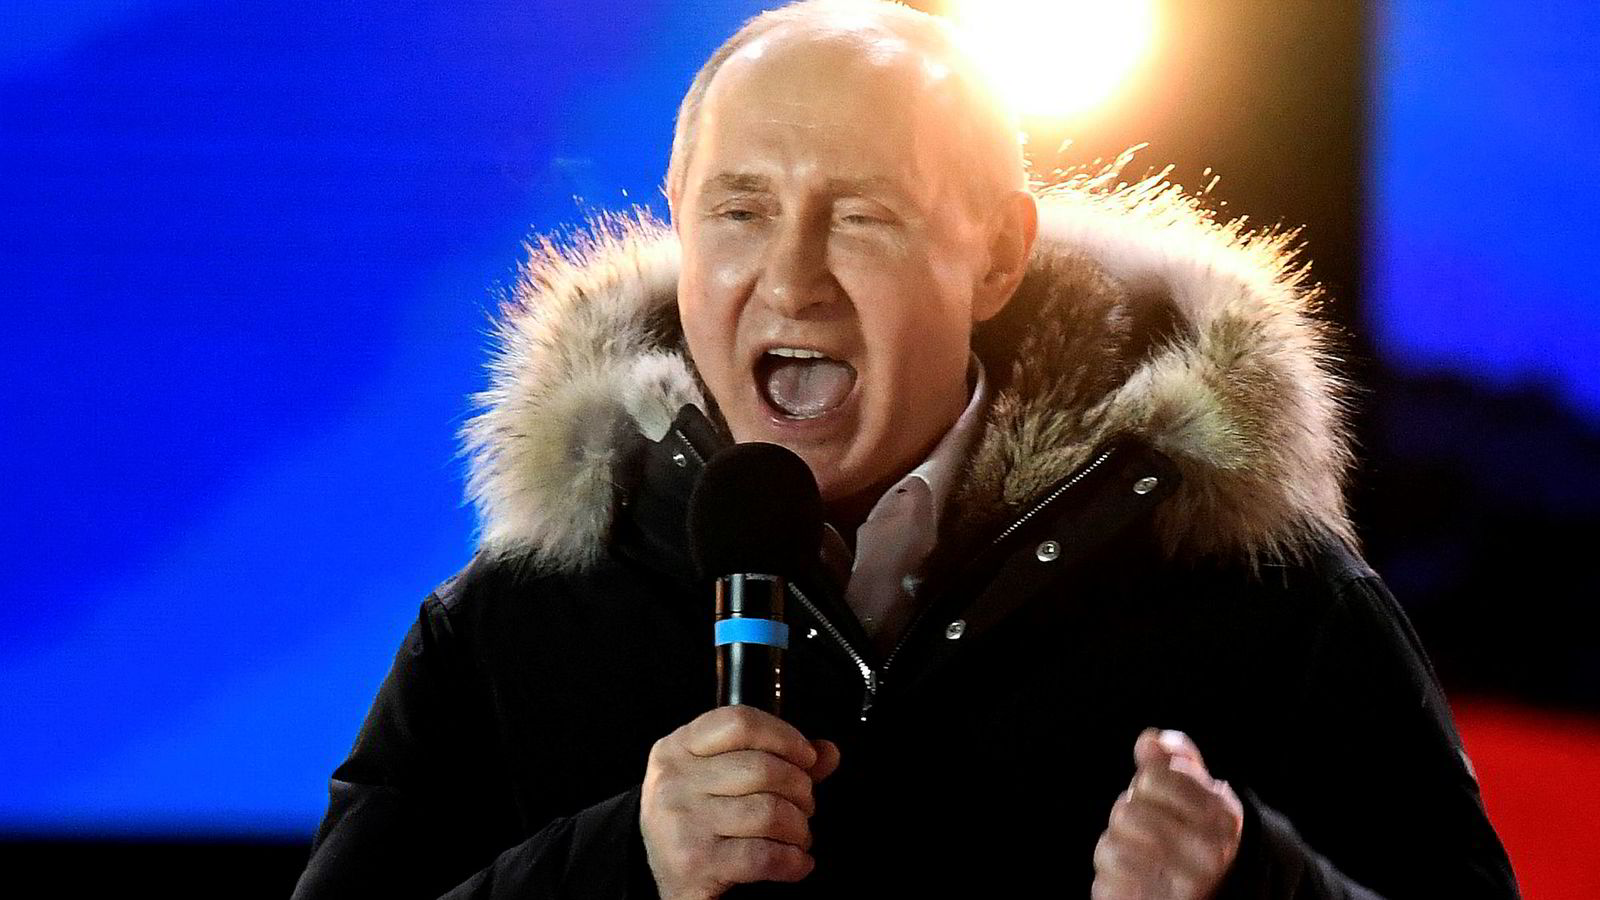 Russlands president Vladimir Putin er ikke fornøyd over russernes musikkpreferanser.